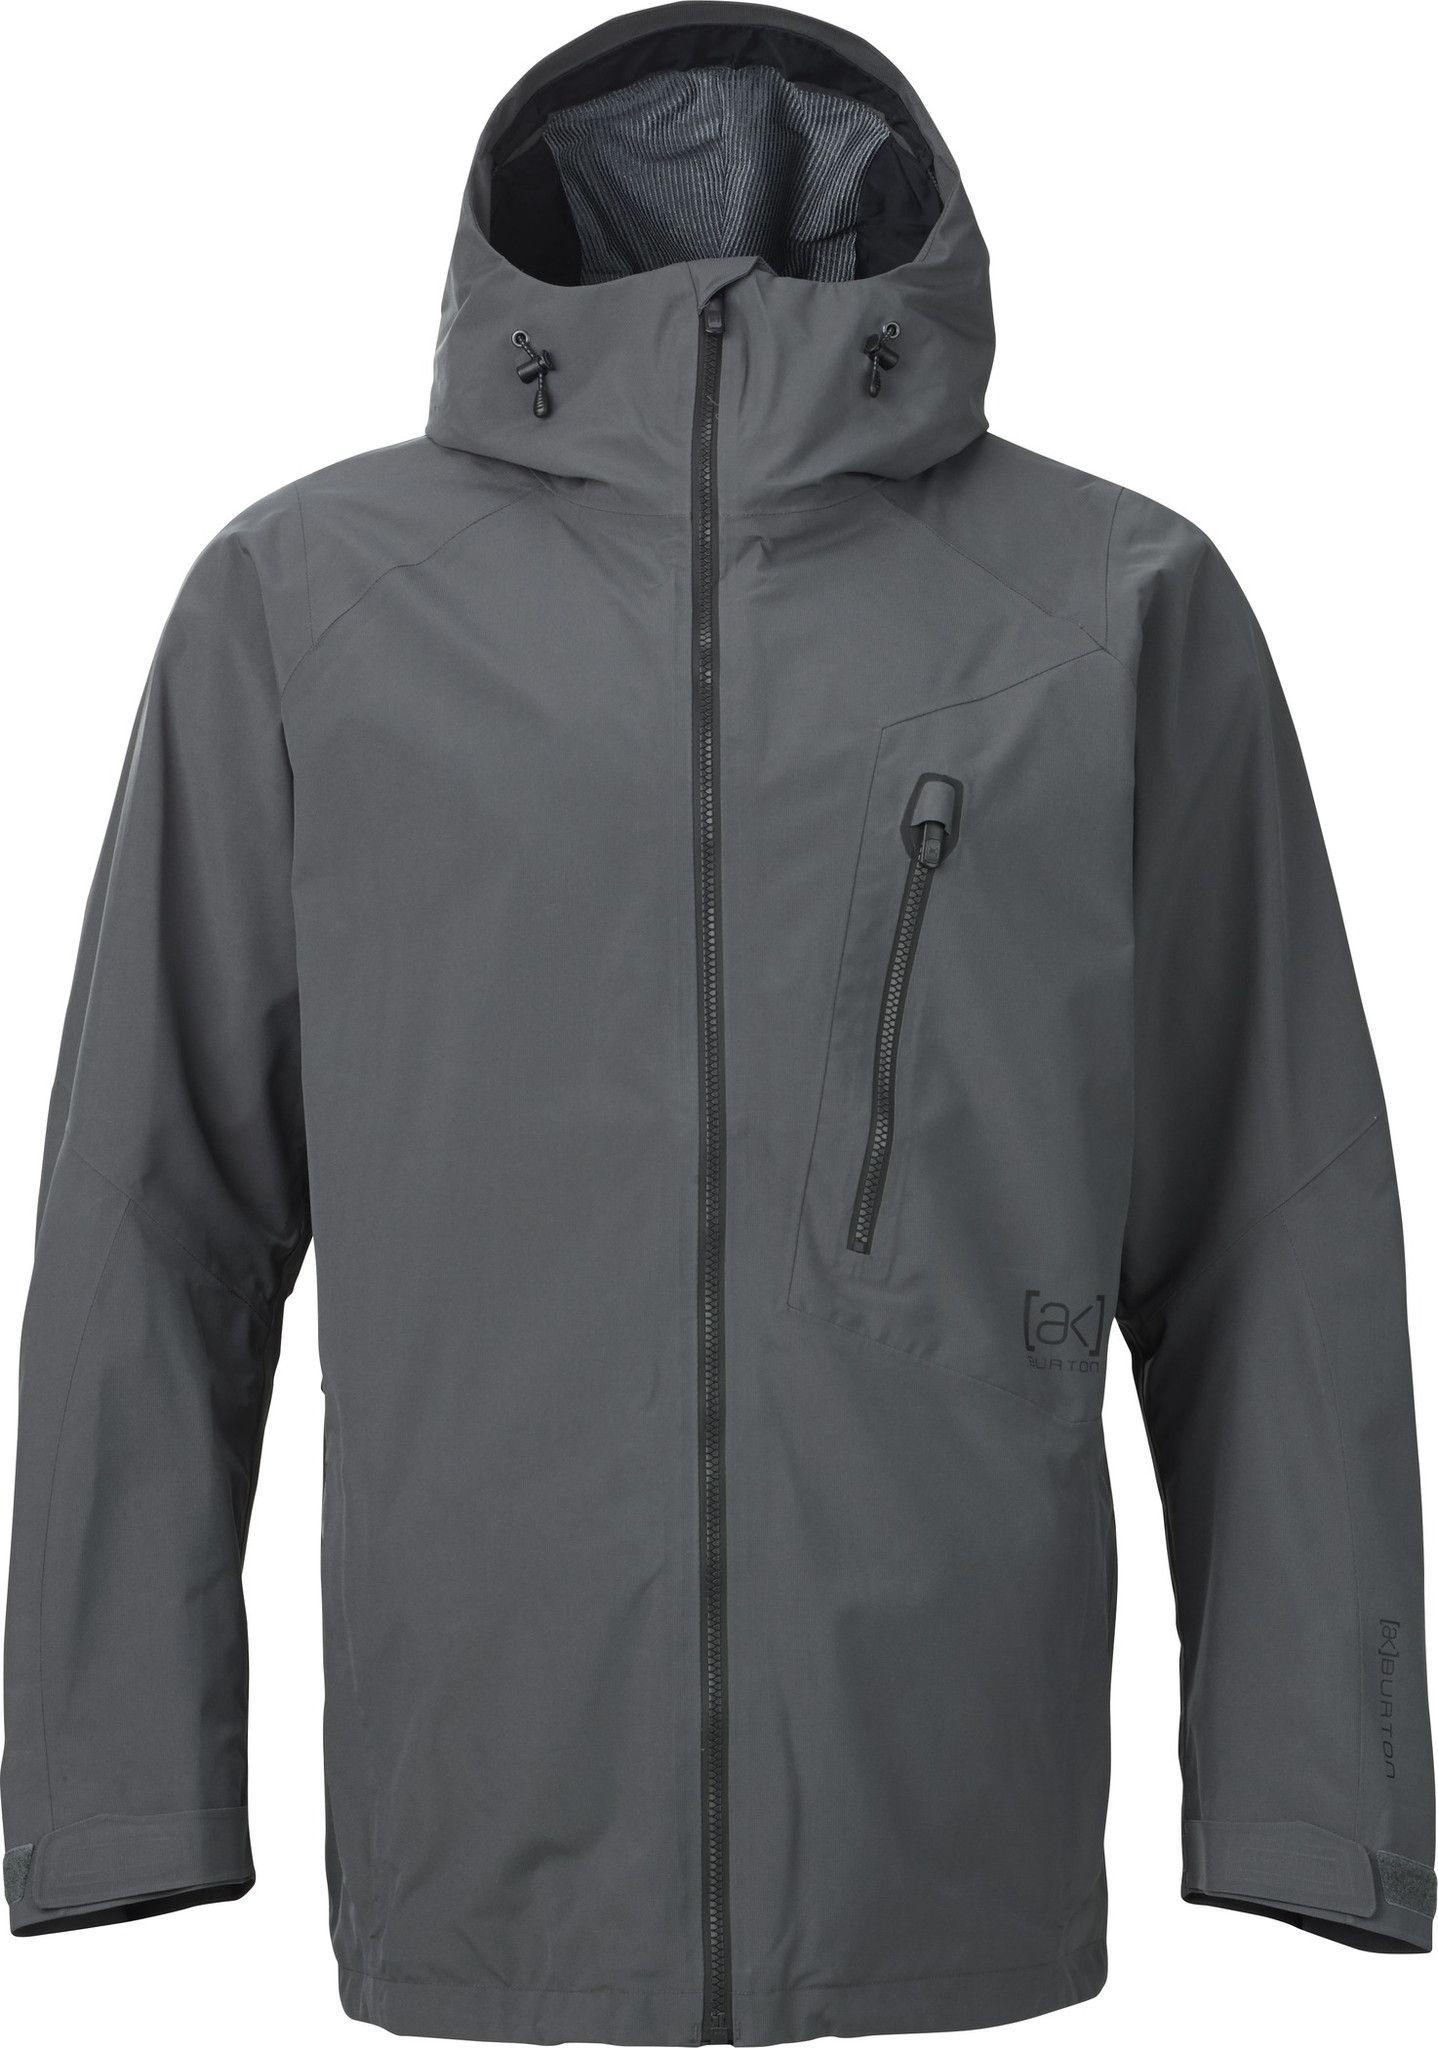 Burton Mens Snowboard Jacket ak 2L Cyclic Jacket